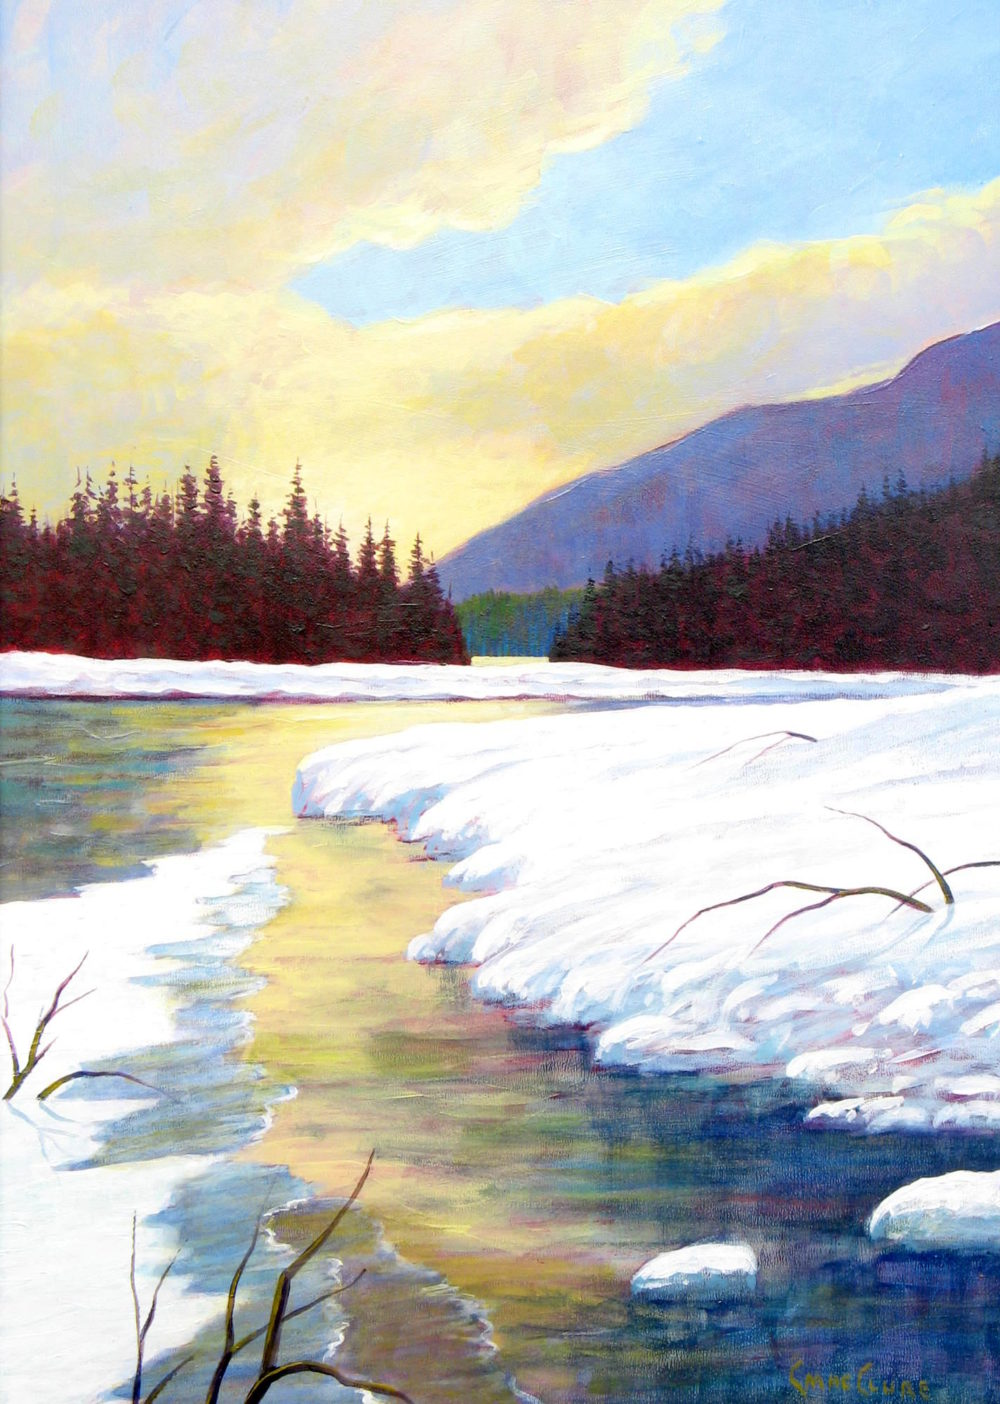 Winter Wonderland Chris MacClure